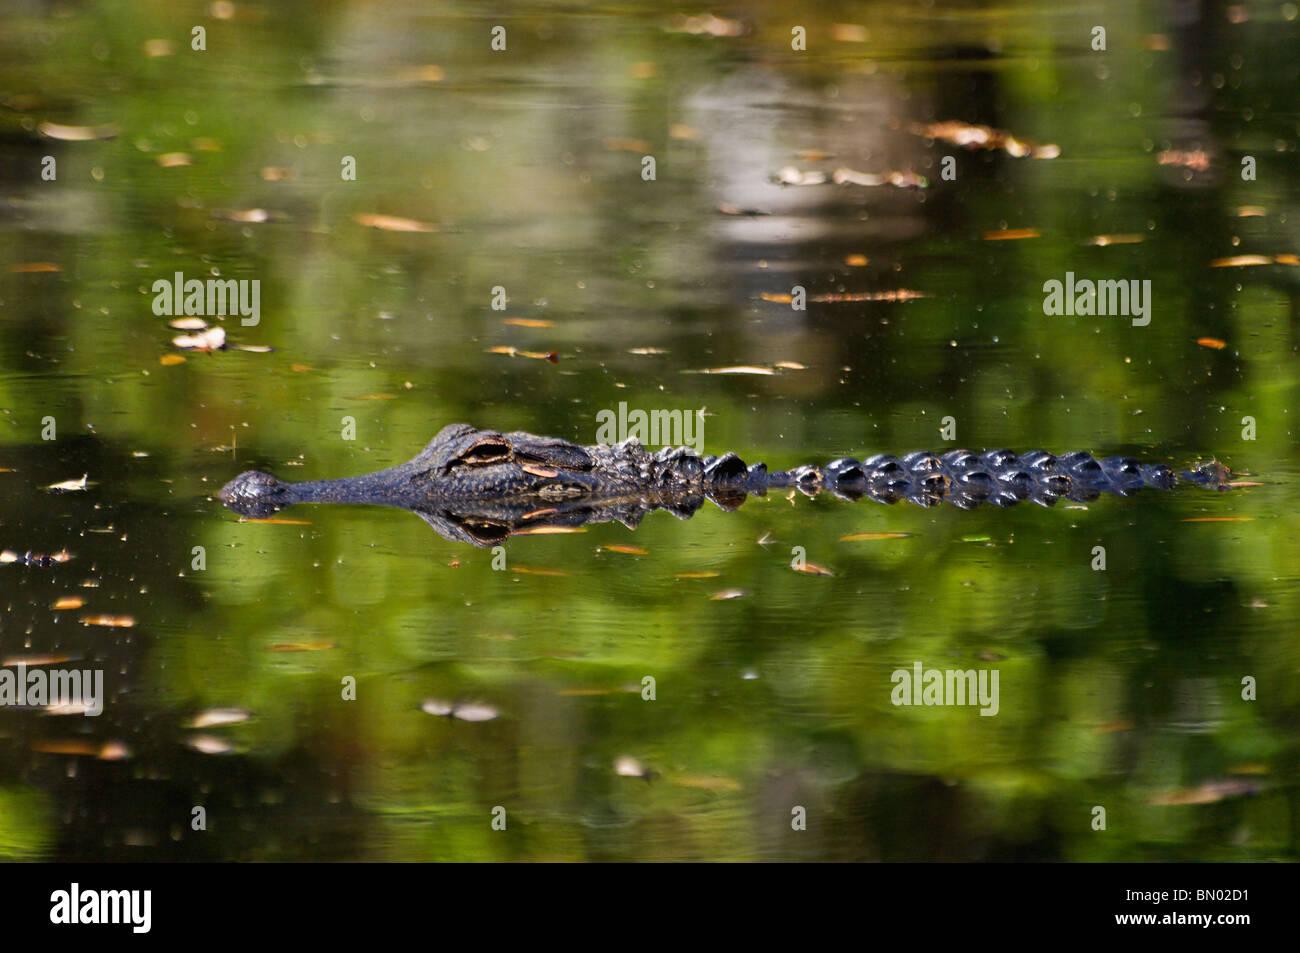 American Alligator Swimming in Lake at Magnolia Plantation in Charleston County, South Carolina - Stock Image